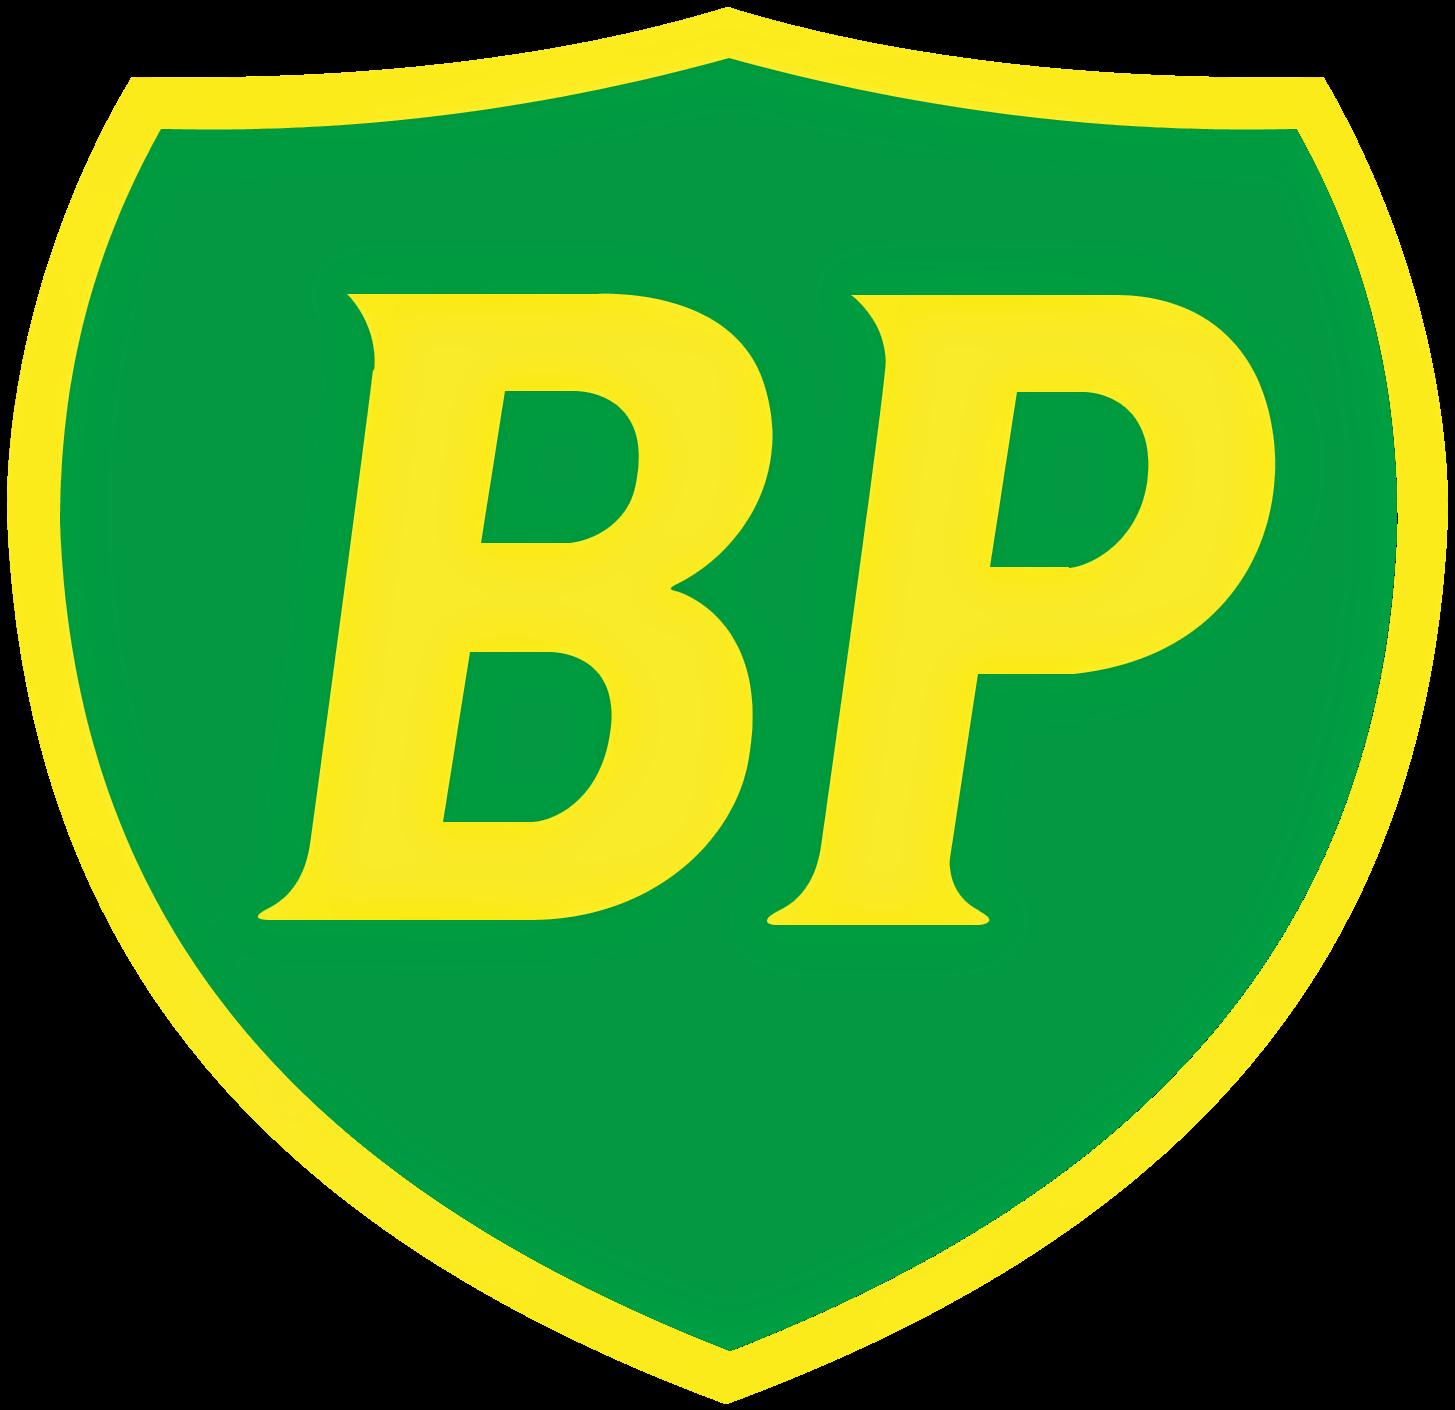 All About Logo: BP Logo